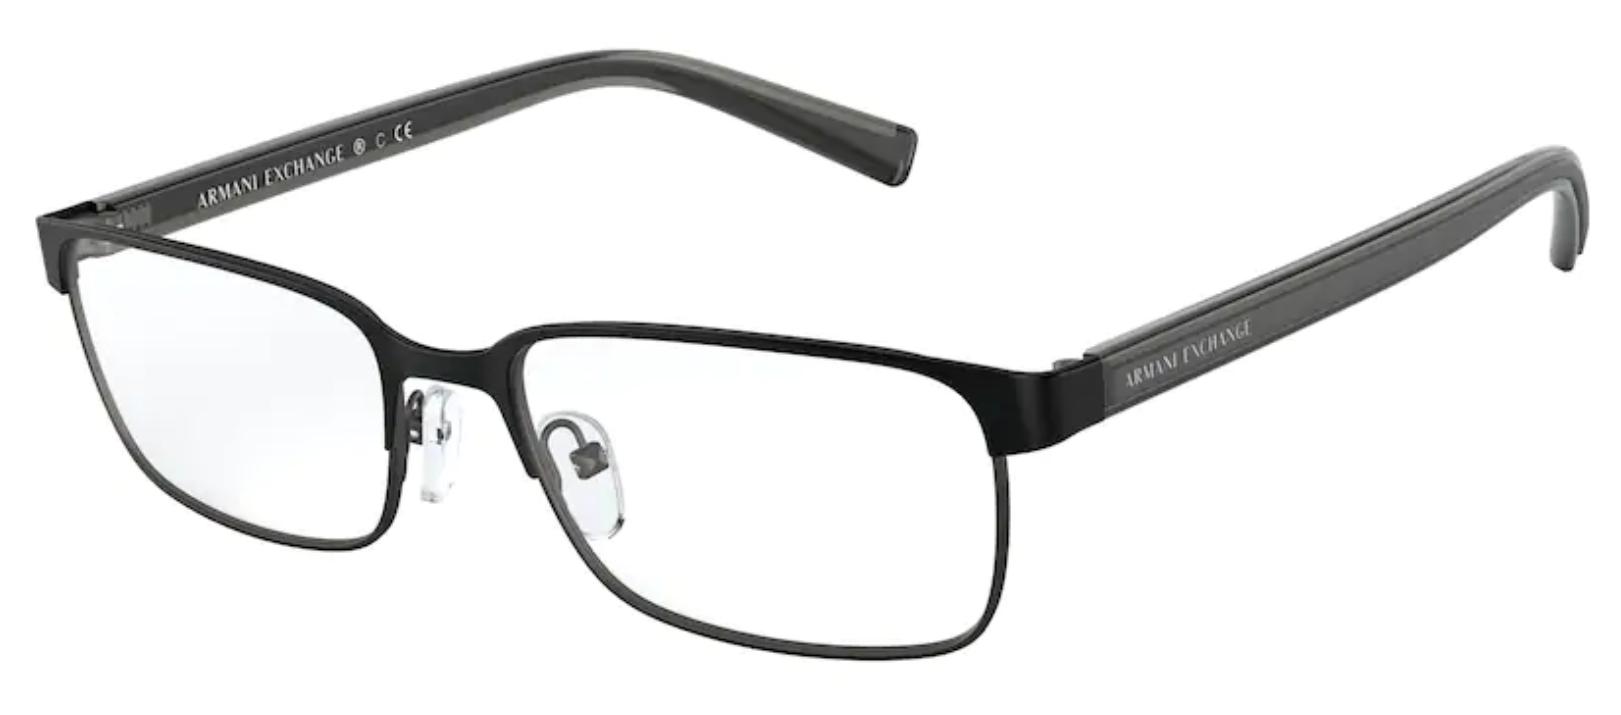 Óculos de Grau Armani Exchange Masculino AX 1042 6063 Tam.56